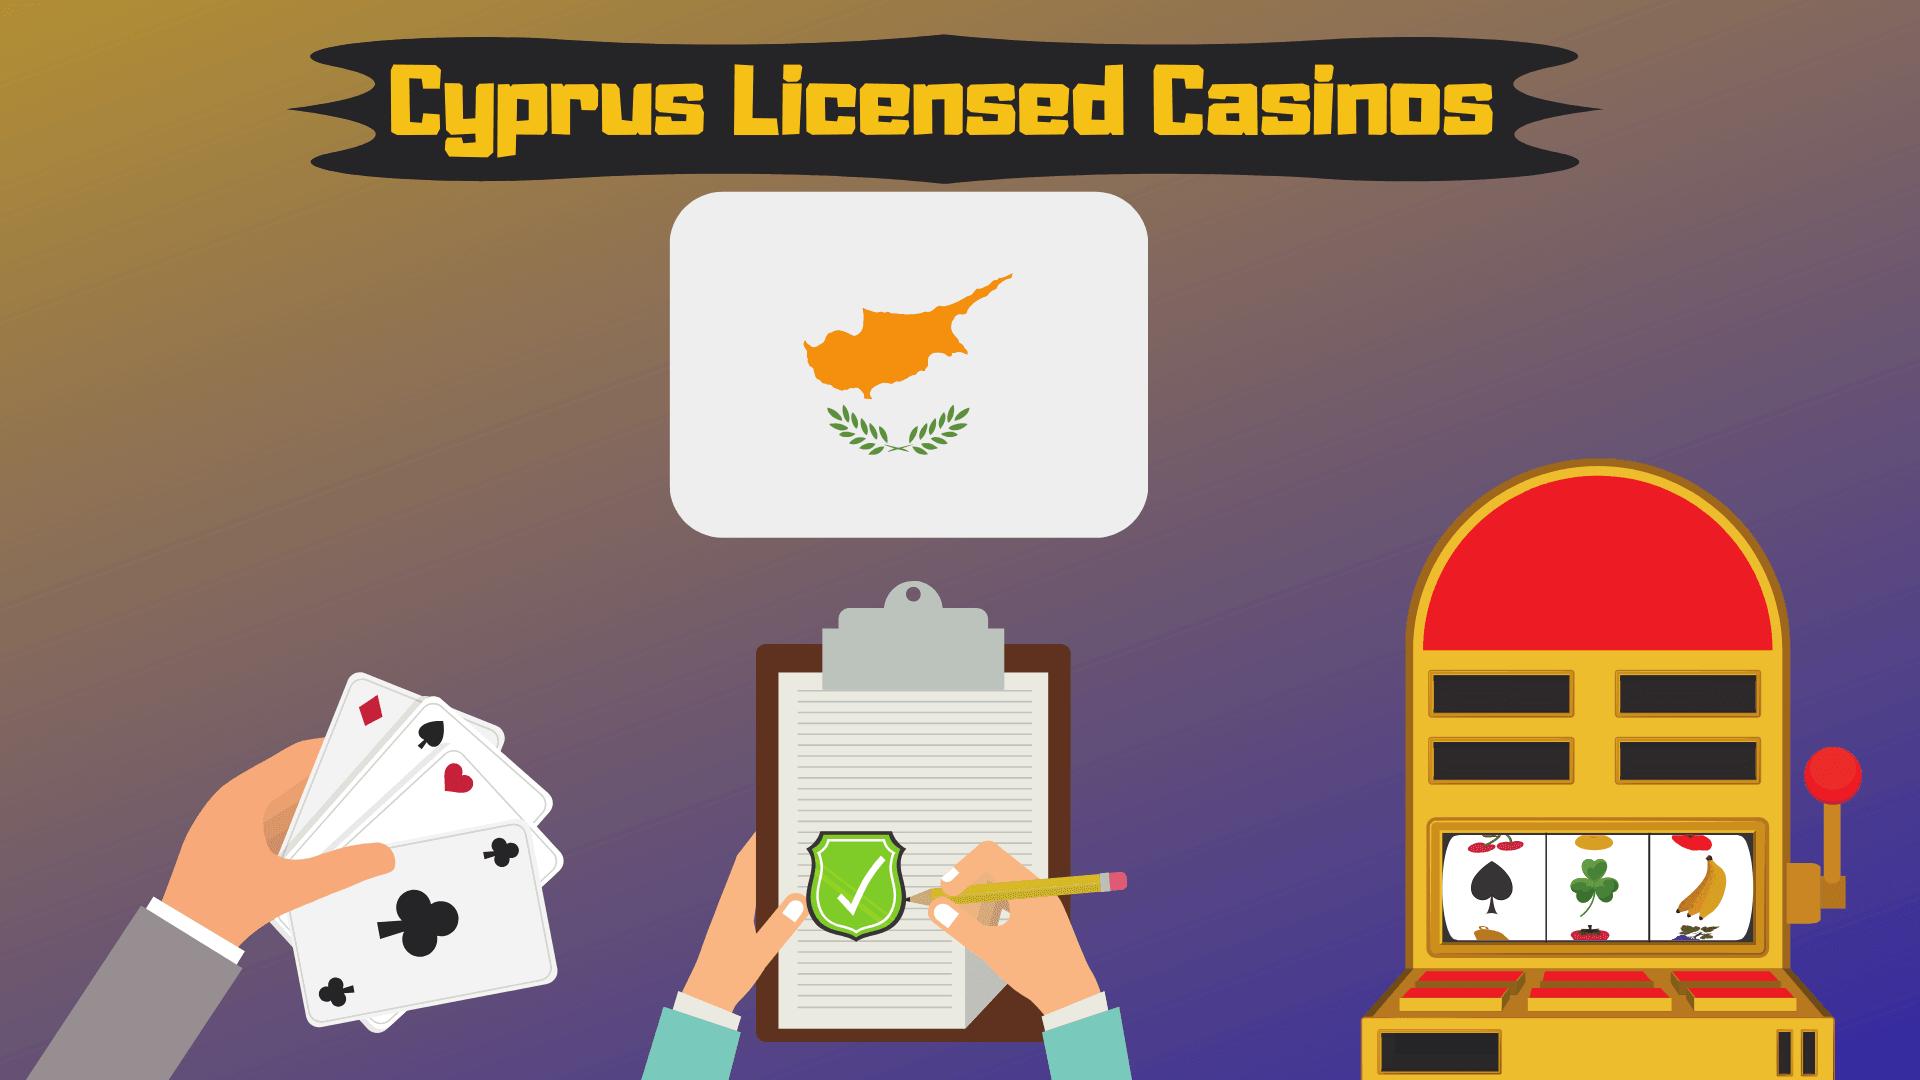 Cyprus Licensed Casinos